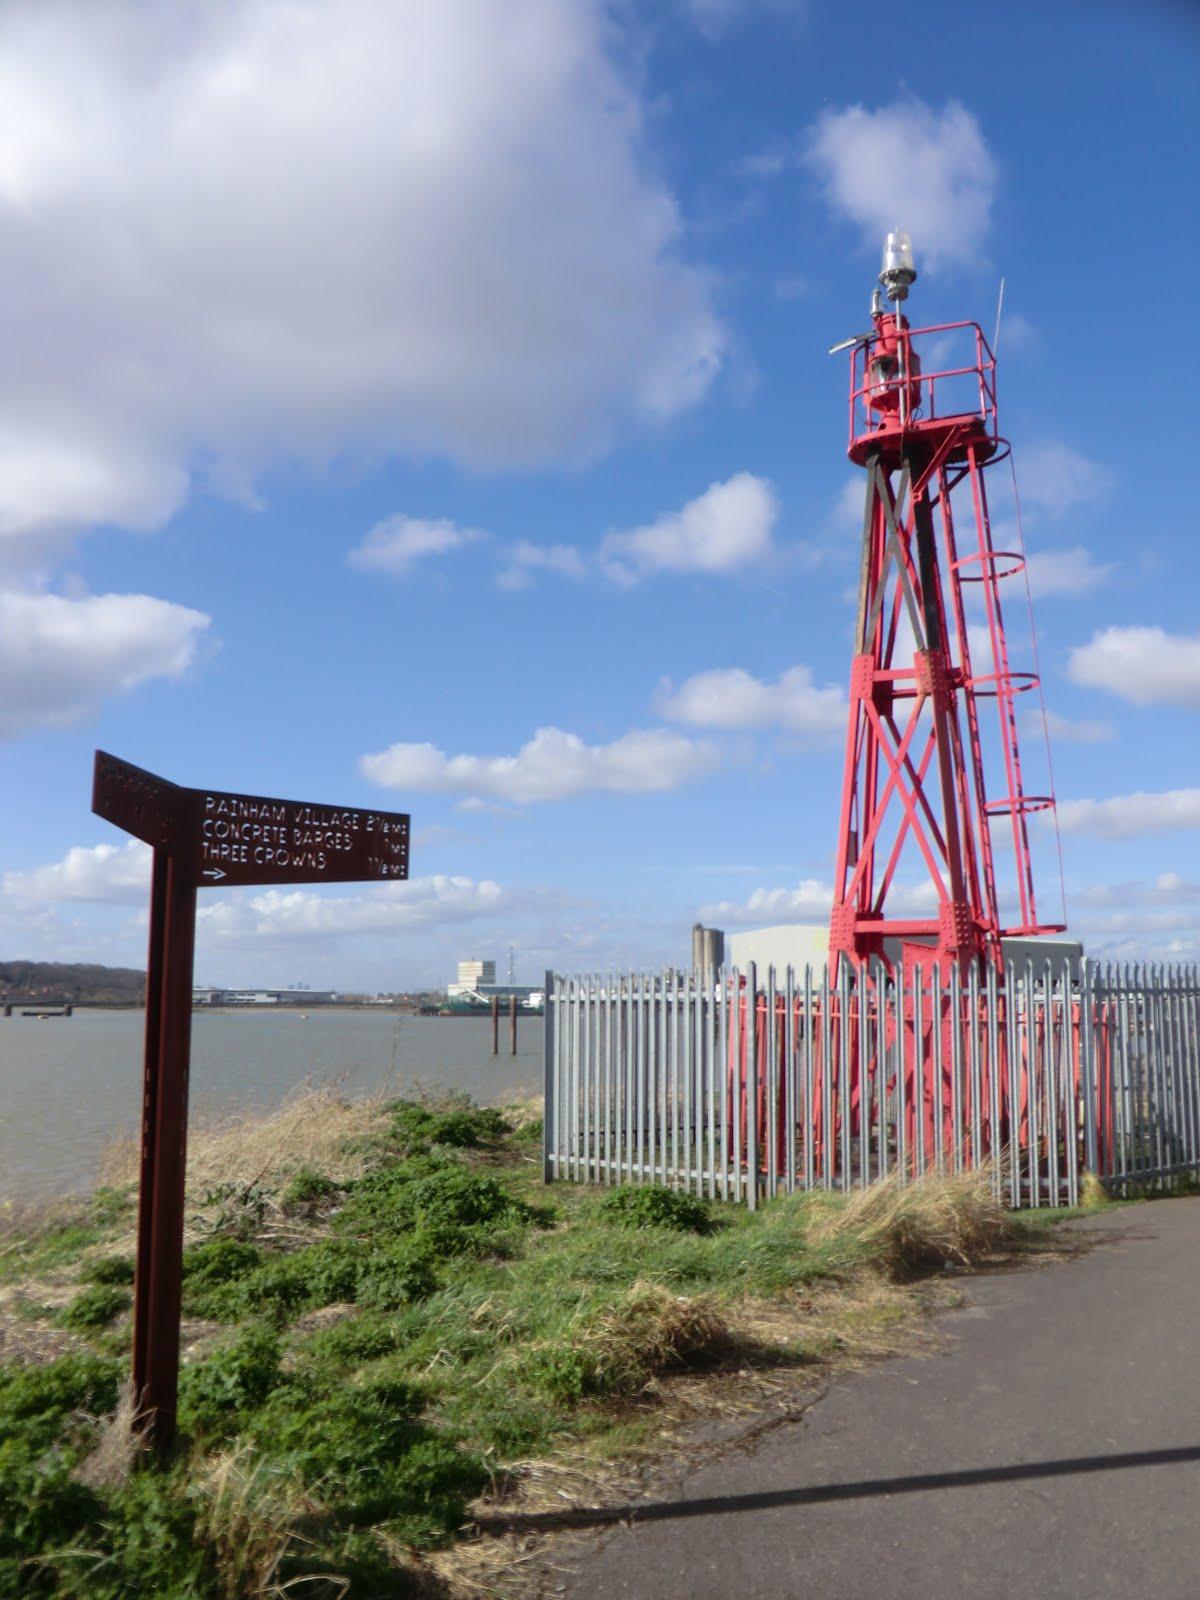 CIMG9949 Coldharbour beacon